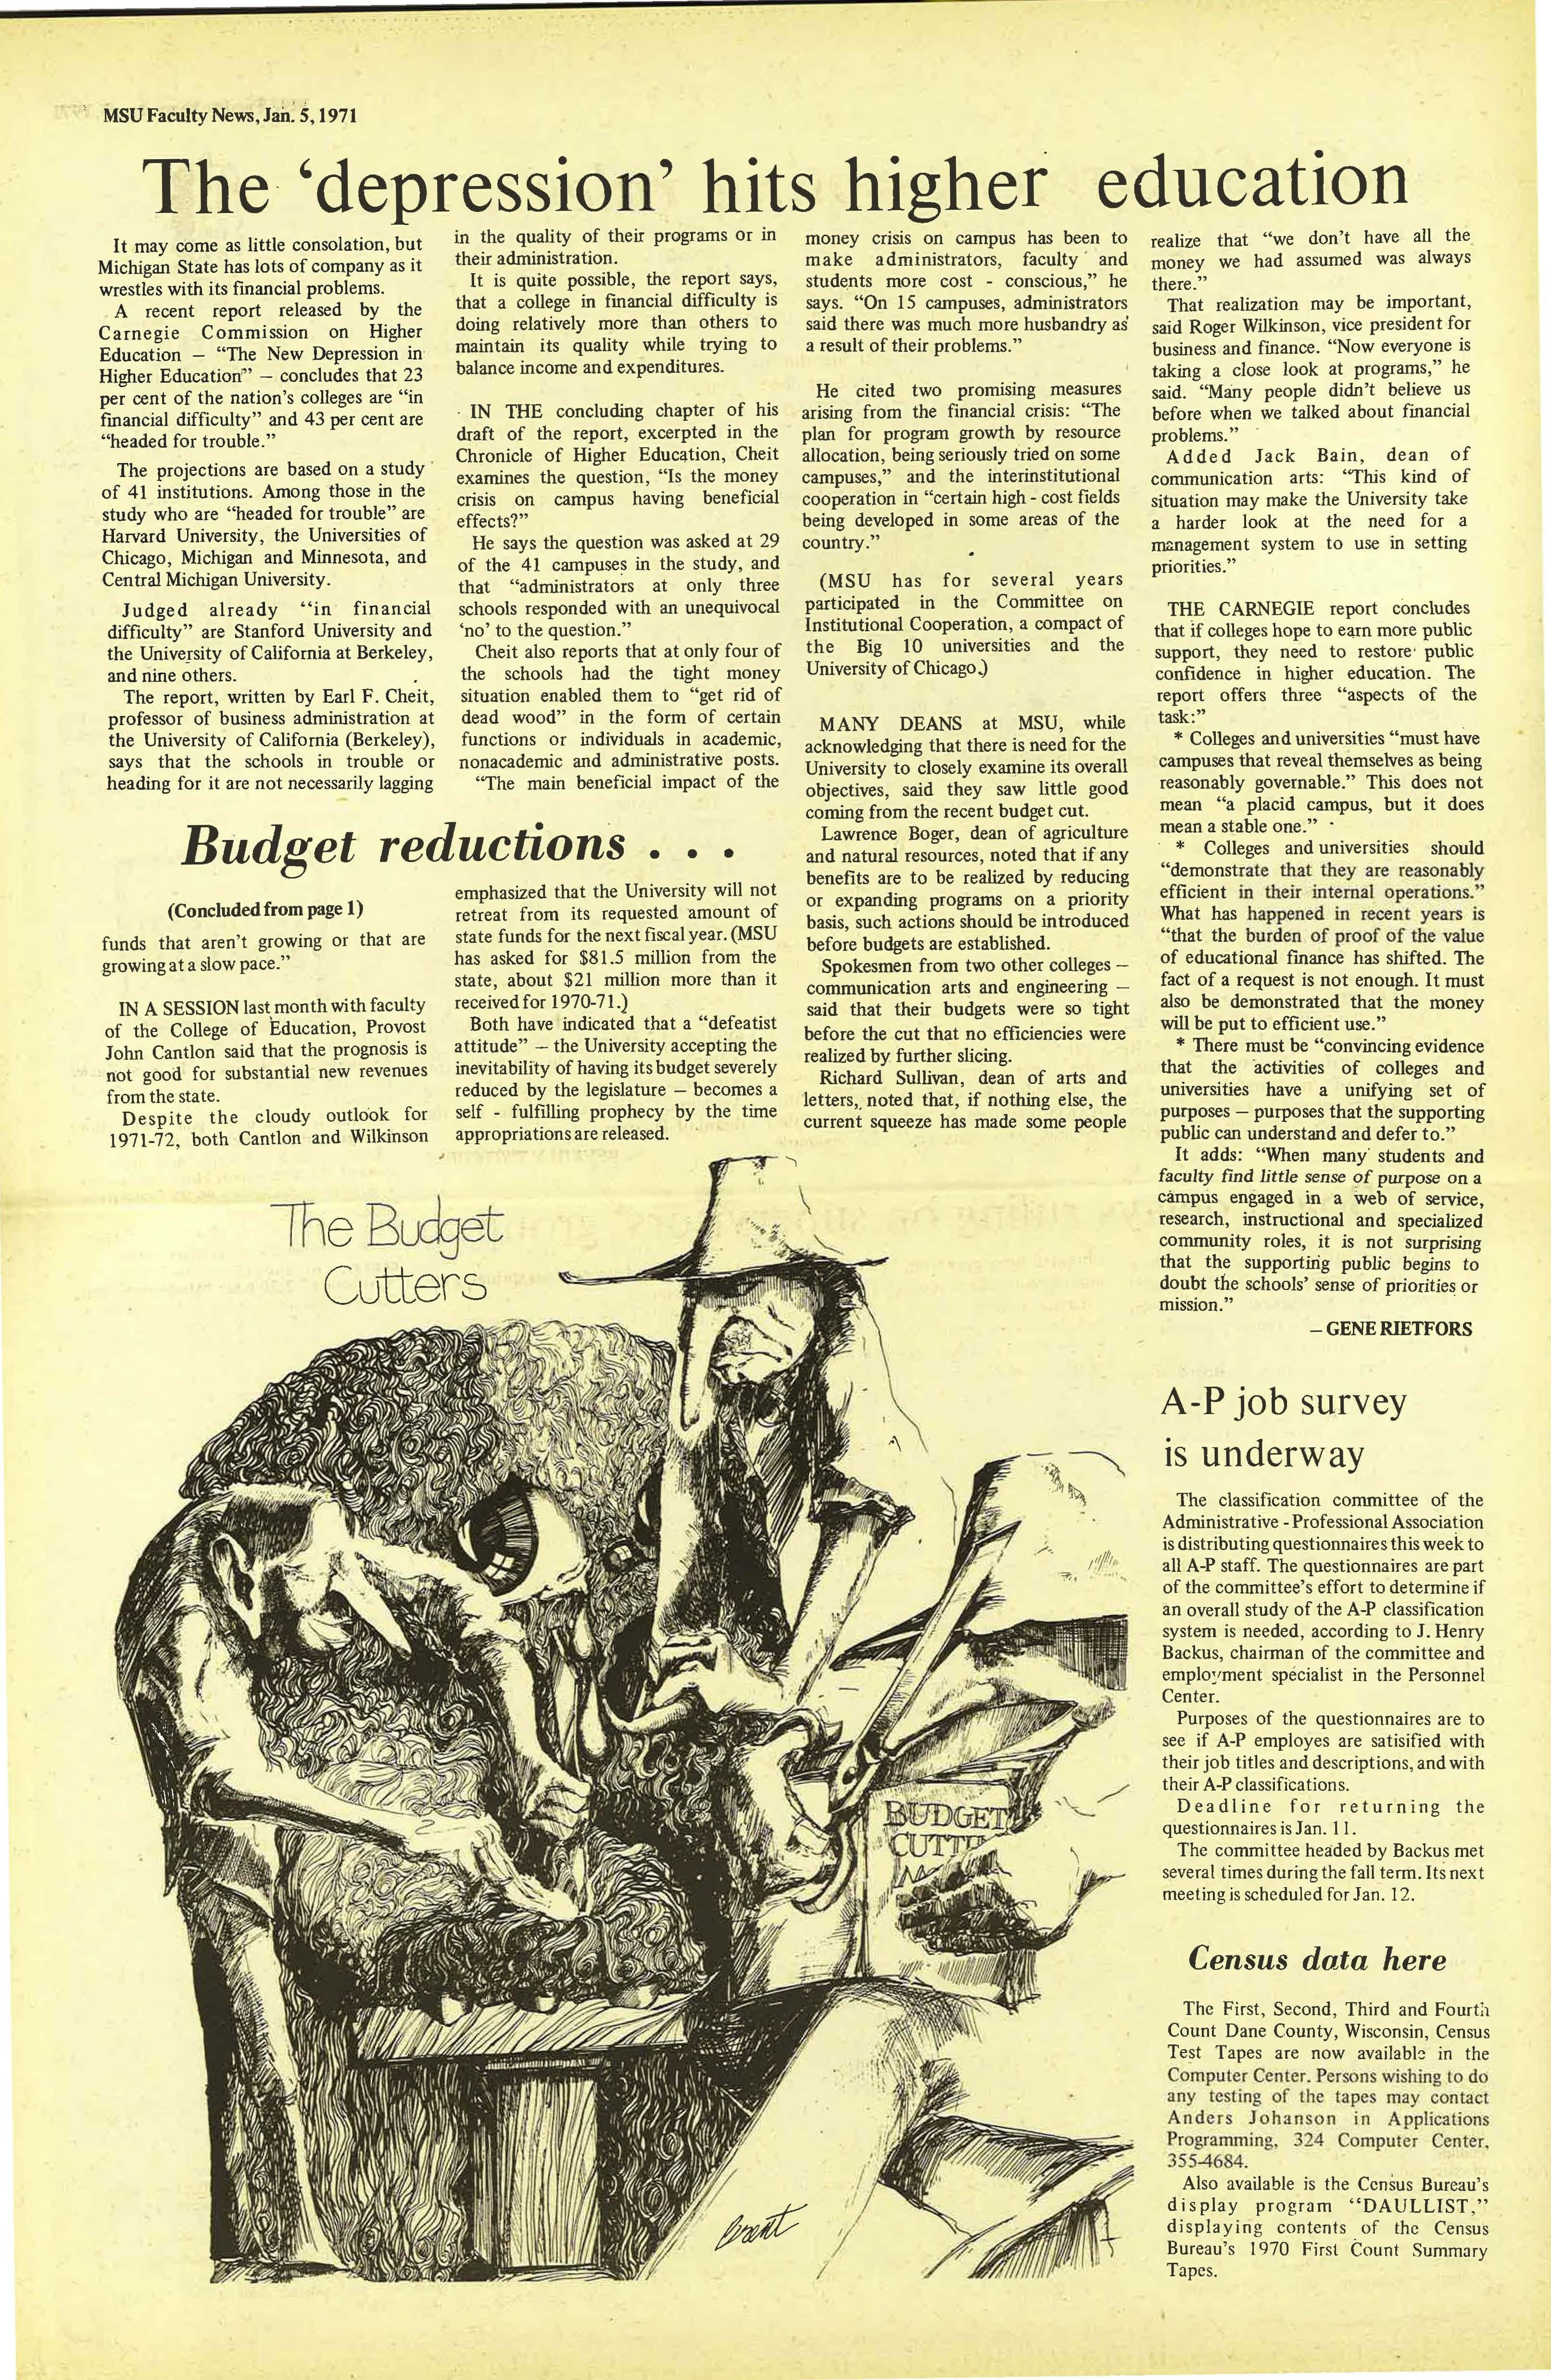 MSU News Bulletin, vol. 3, No. 7, November 4, 1971